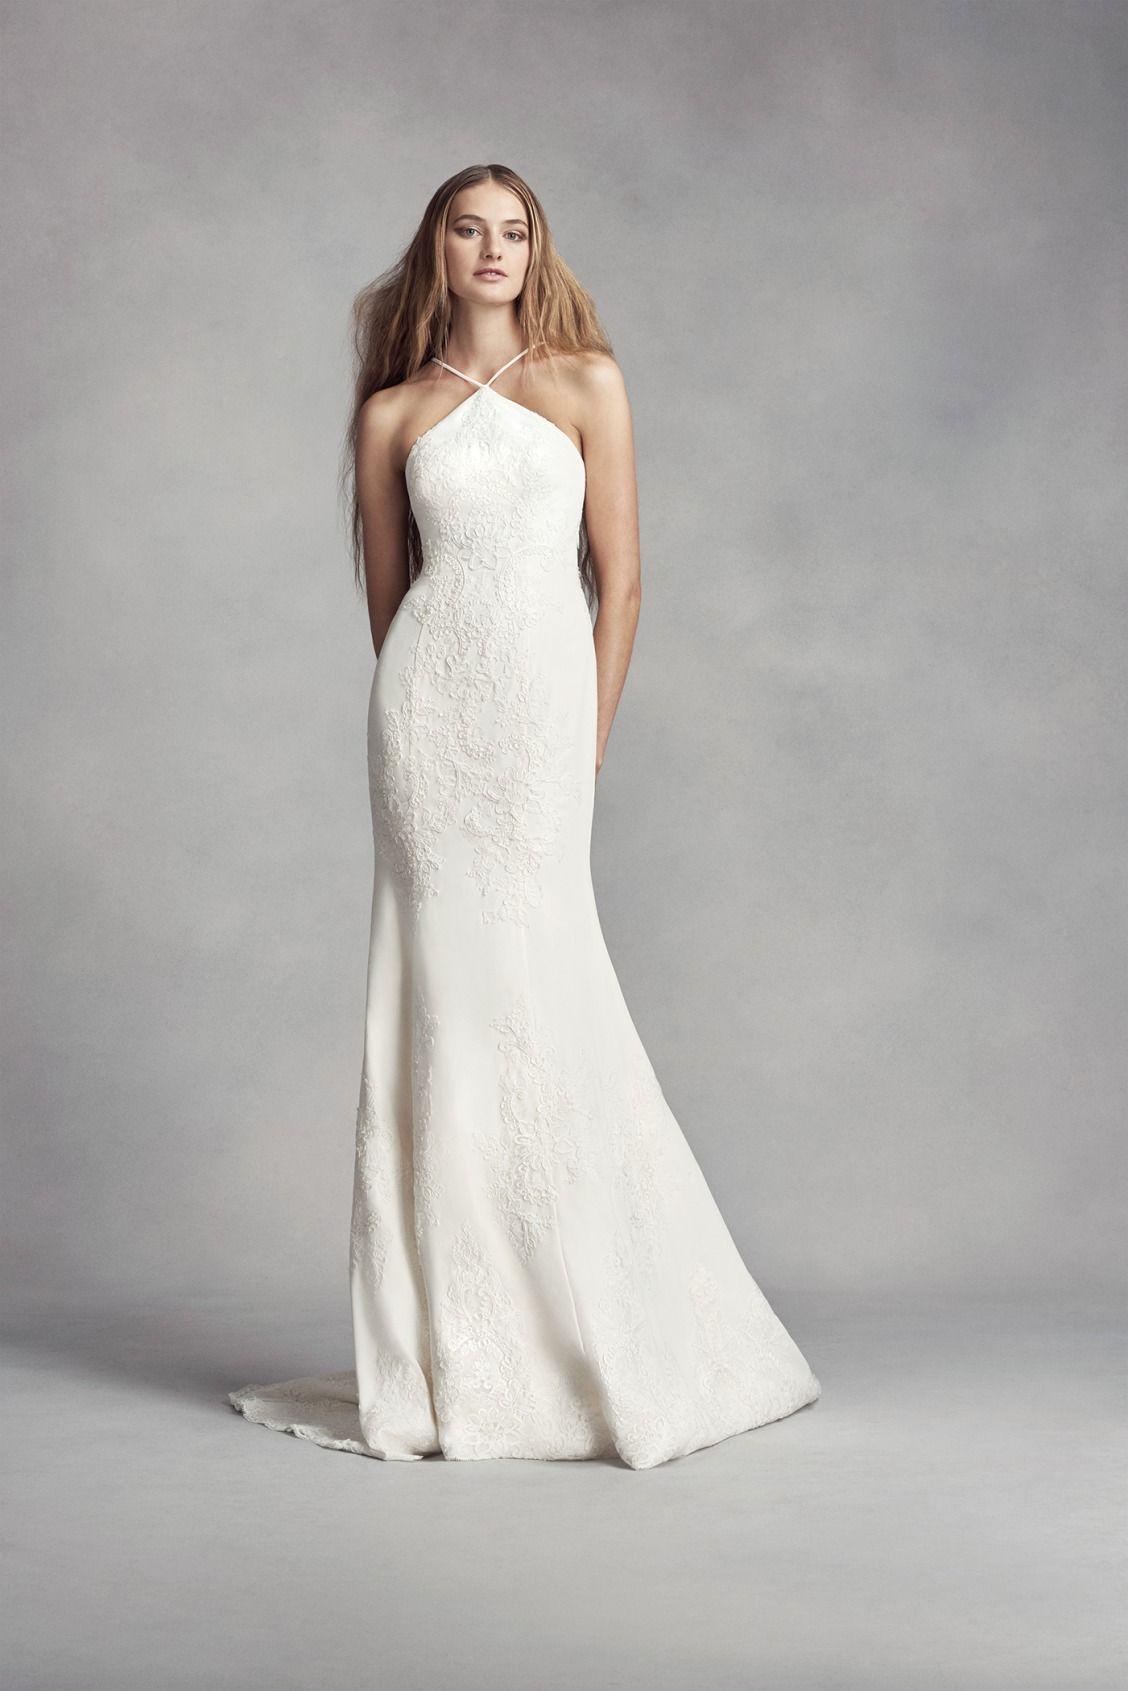 Vera wang designer wedding dresses  For those warm weather weddings this crepe halter sheath wedding